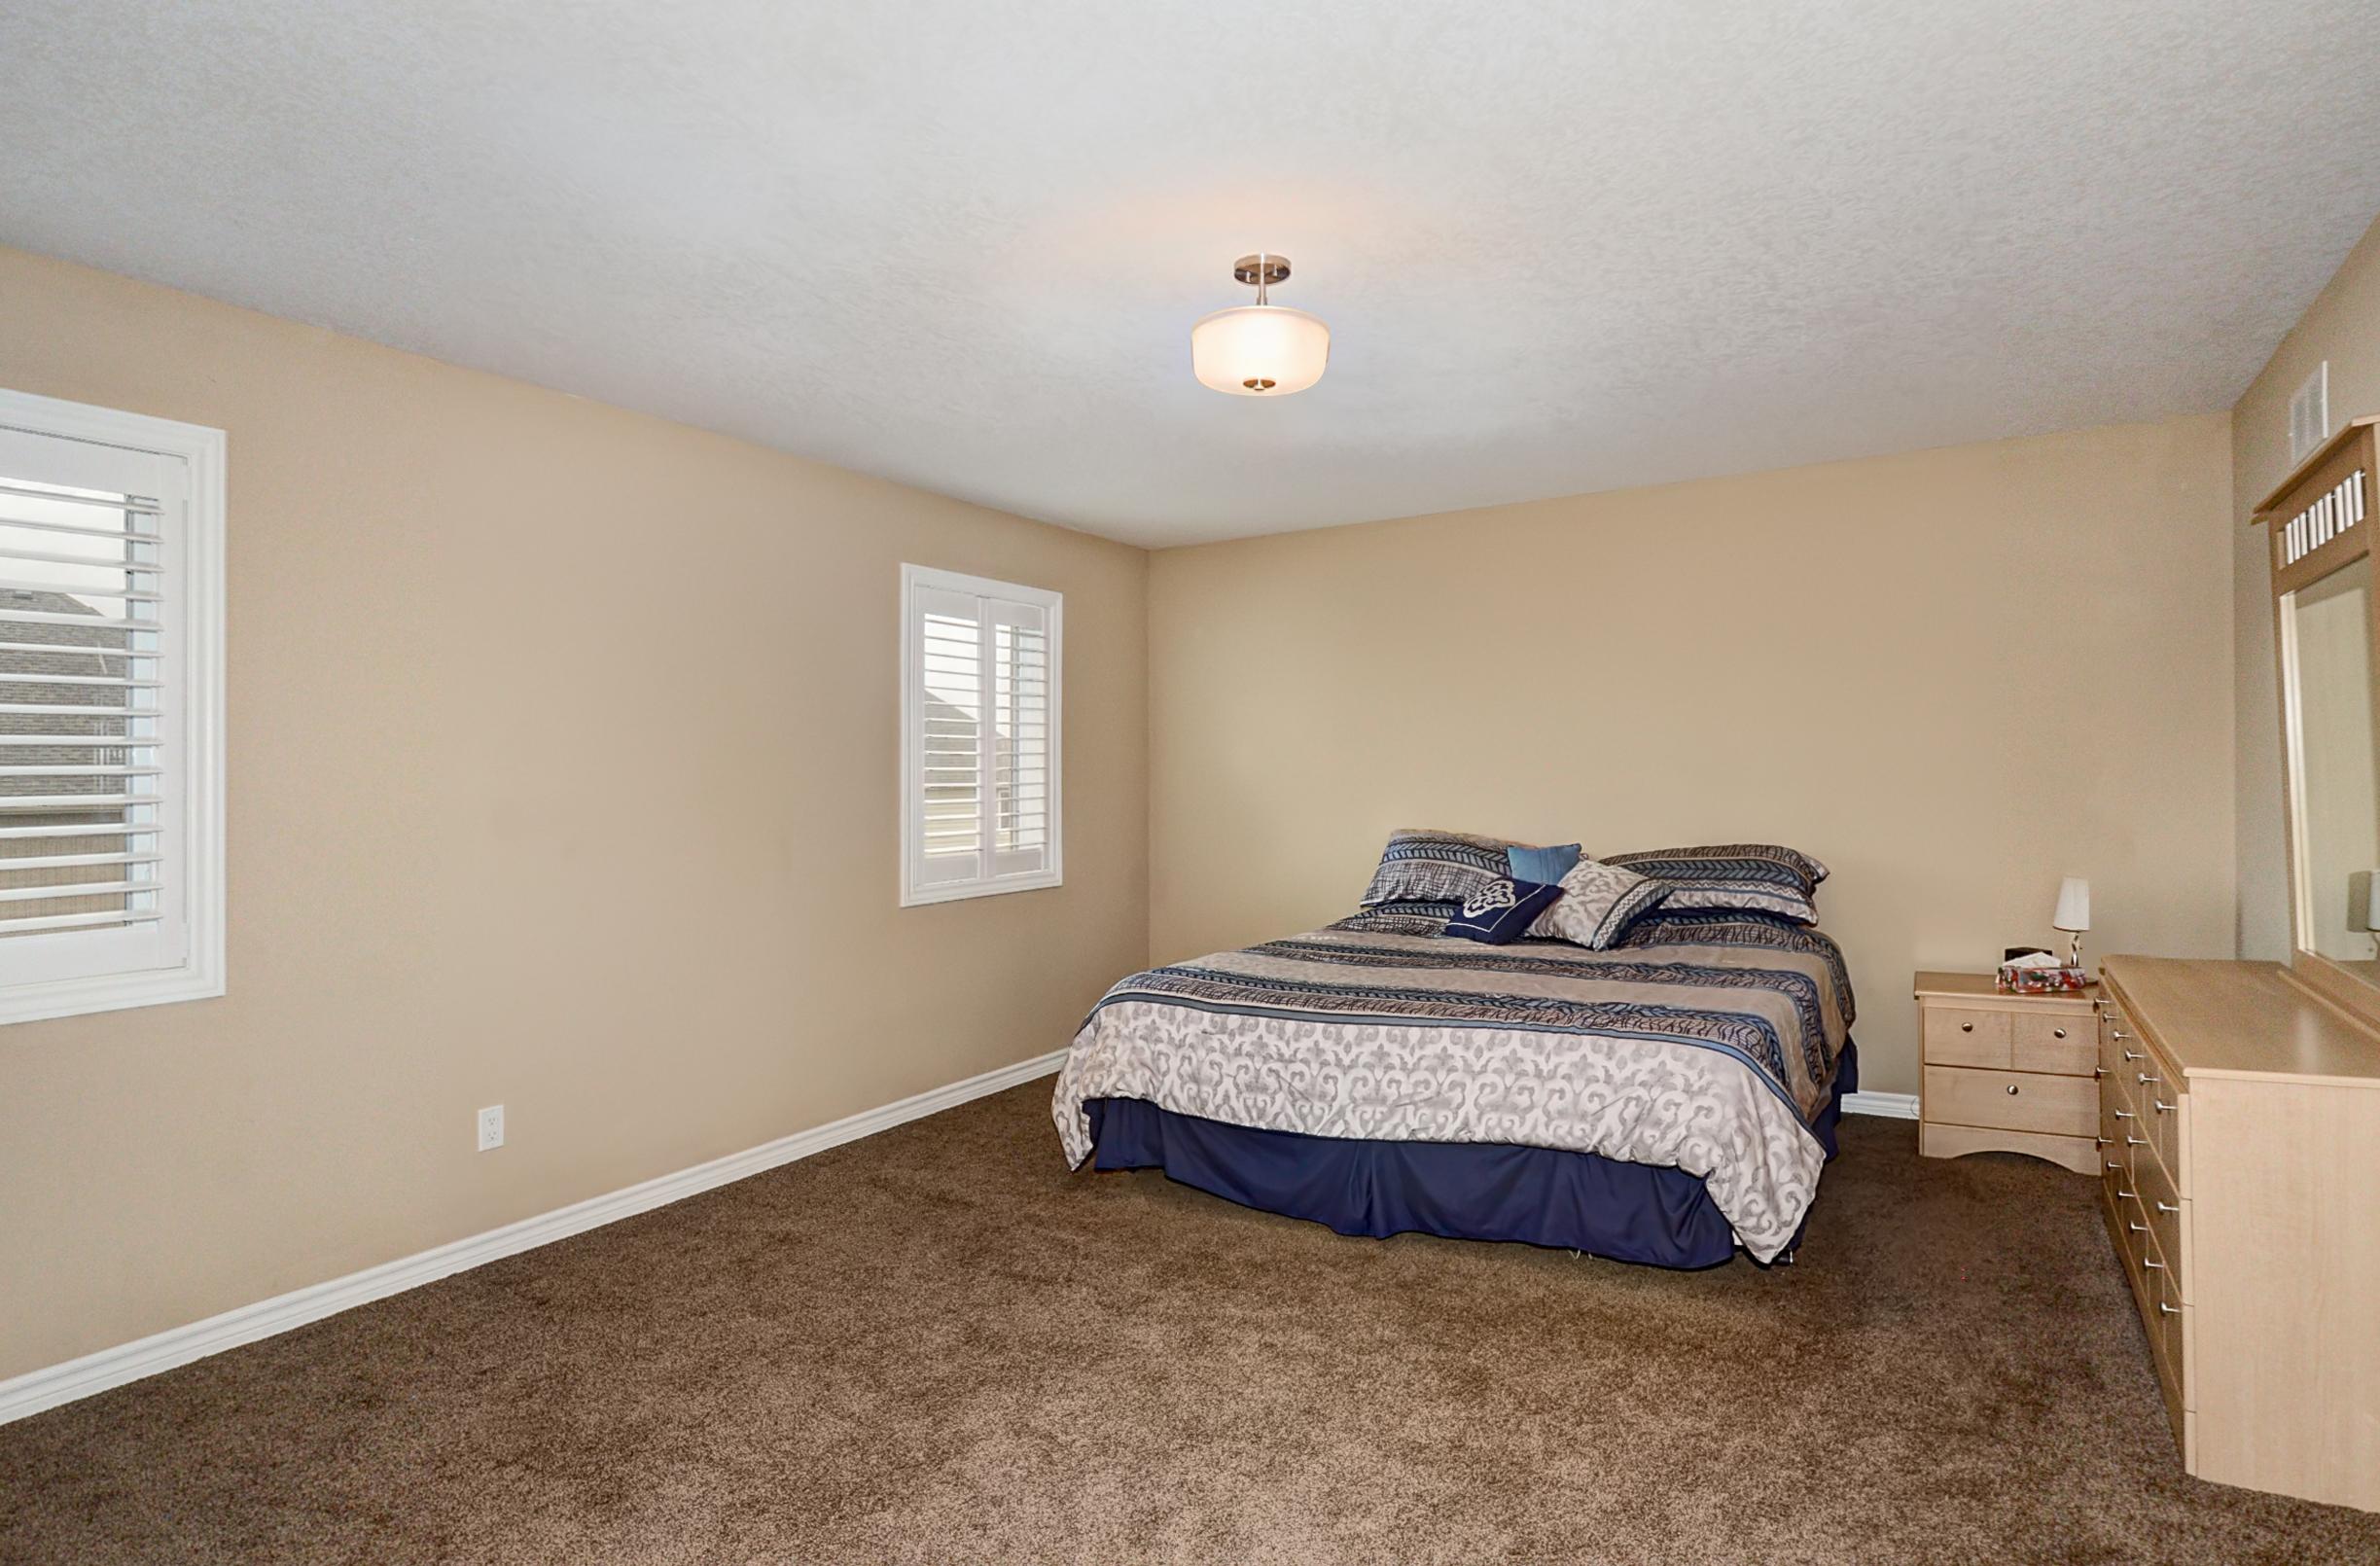 55 Master Bedroom